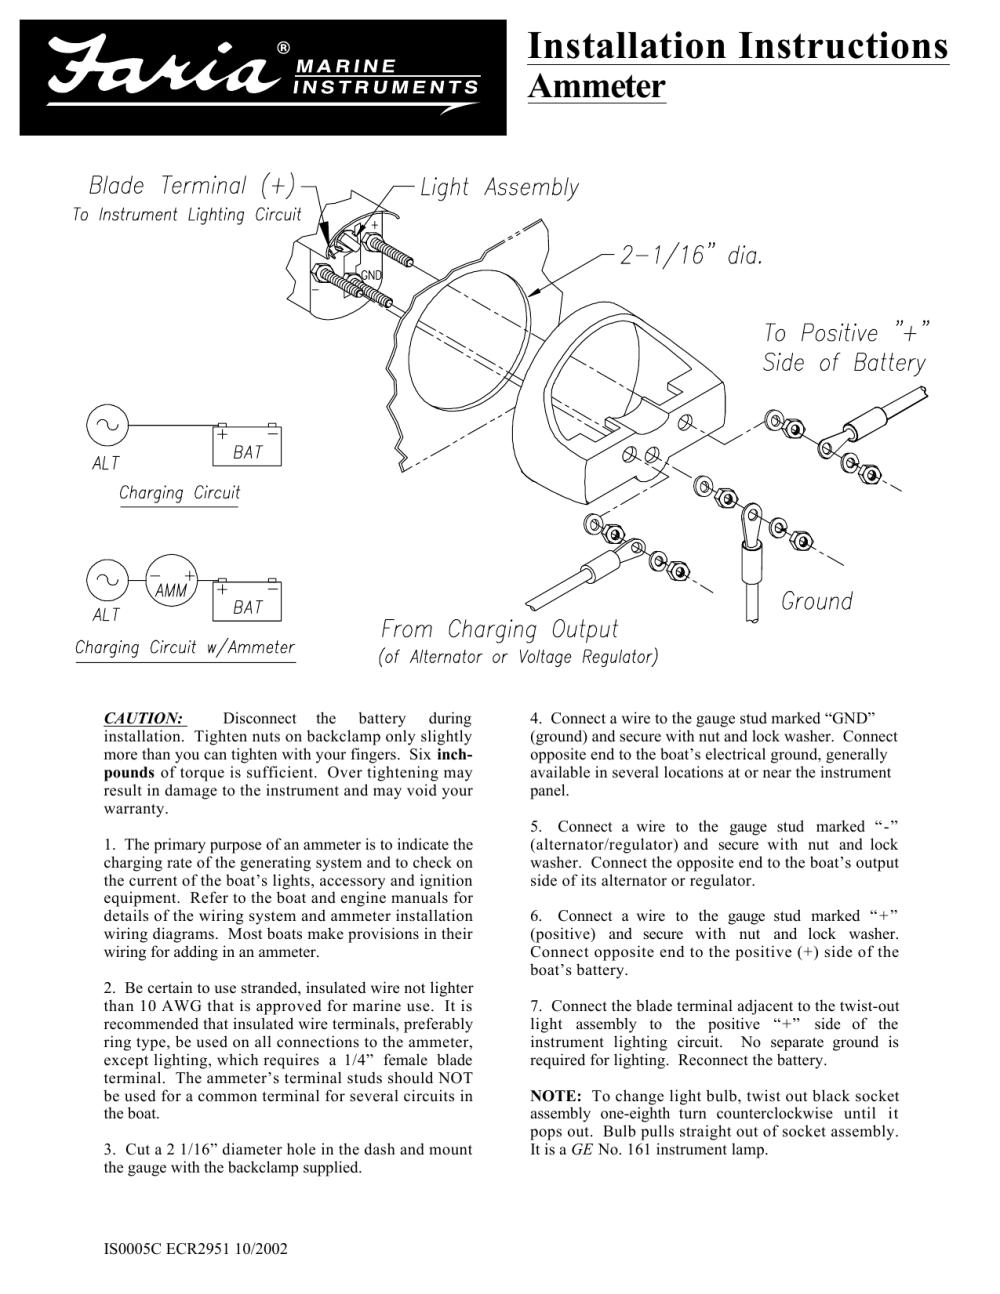 medium resolution of  installation instructions manualzz com on boat trim tabs wiring diagram boat speedo wiring